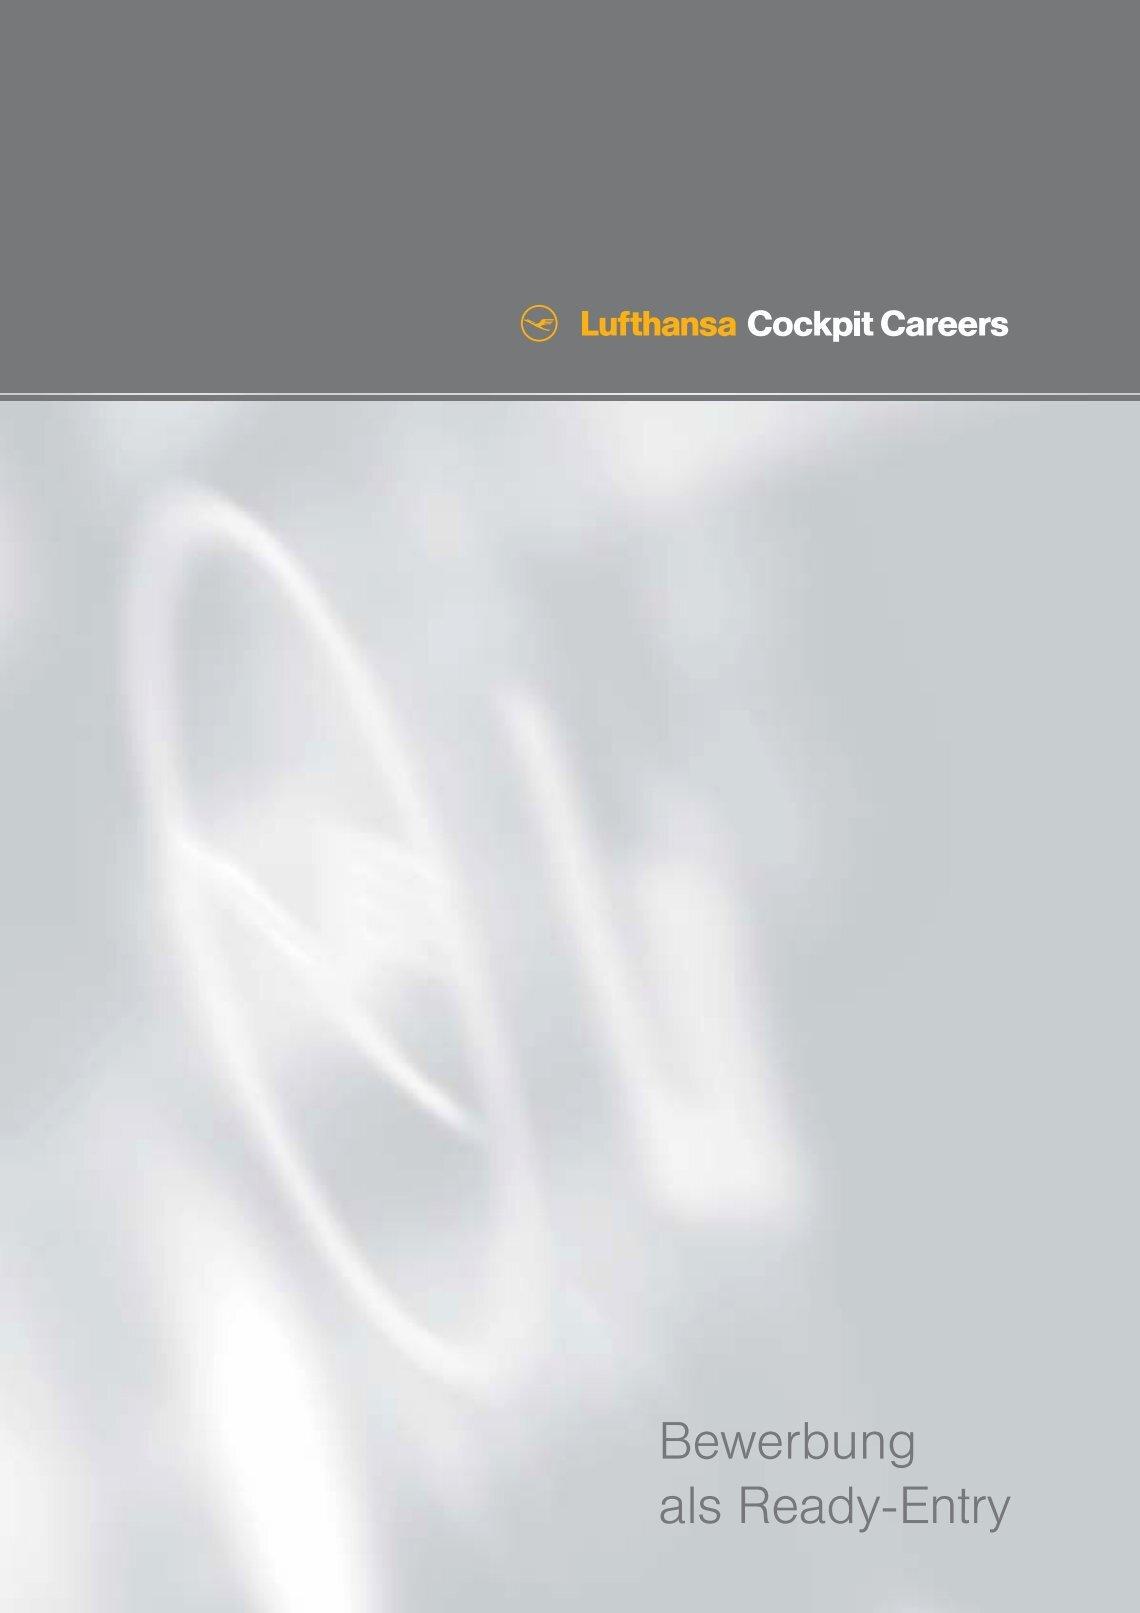 lufthansapilotde - Bewerbung Lufthansa